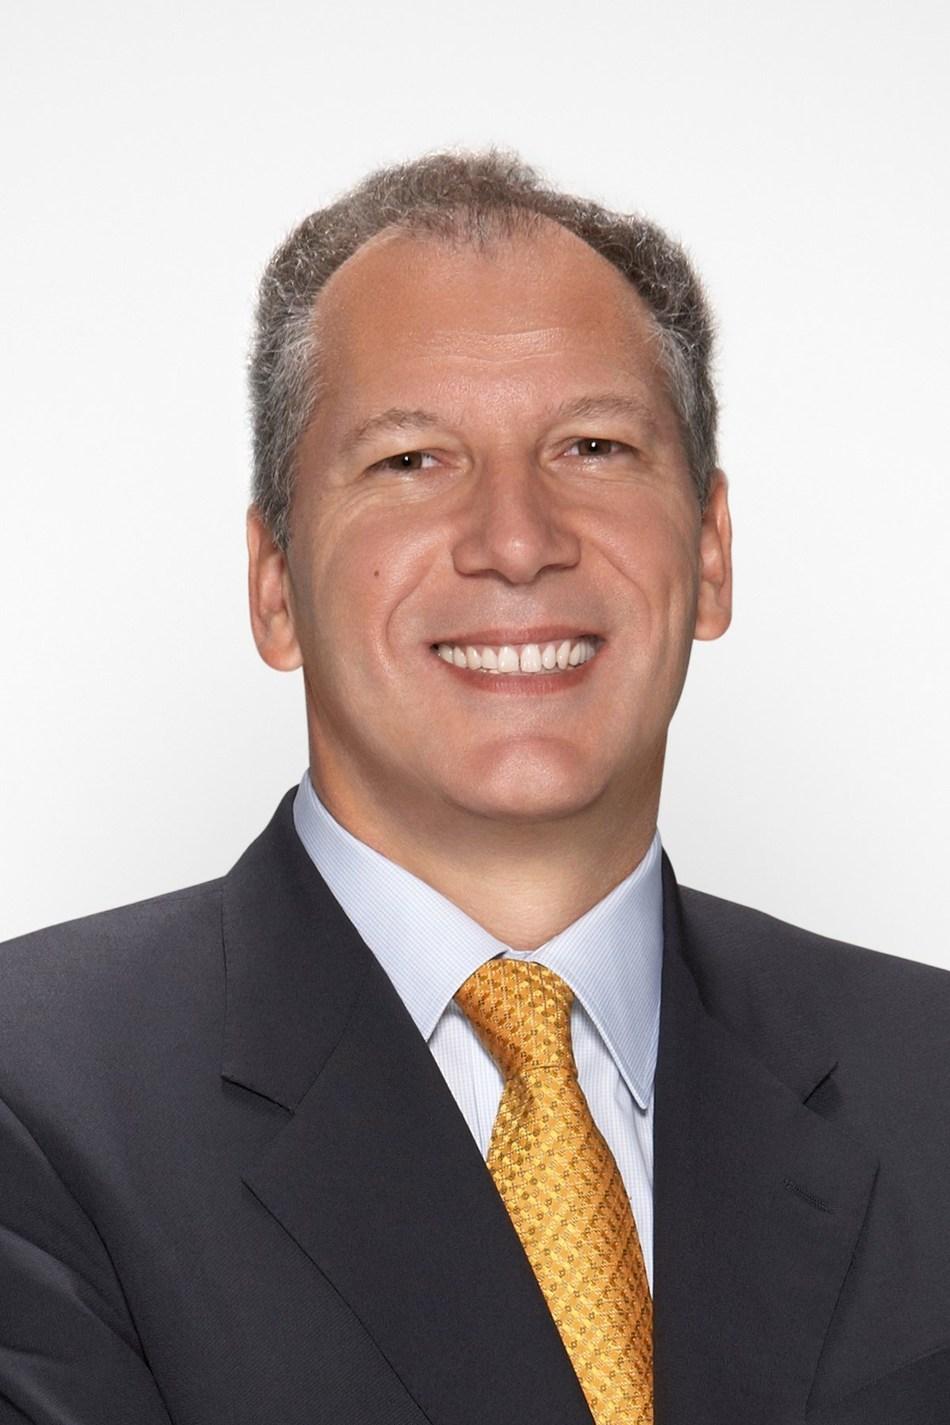 Dario Zamarian (CNW Group/MacDonald, Dettwiler and Associates Ltd.)